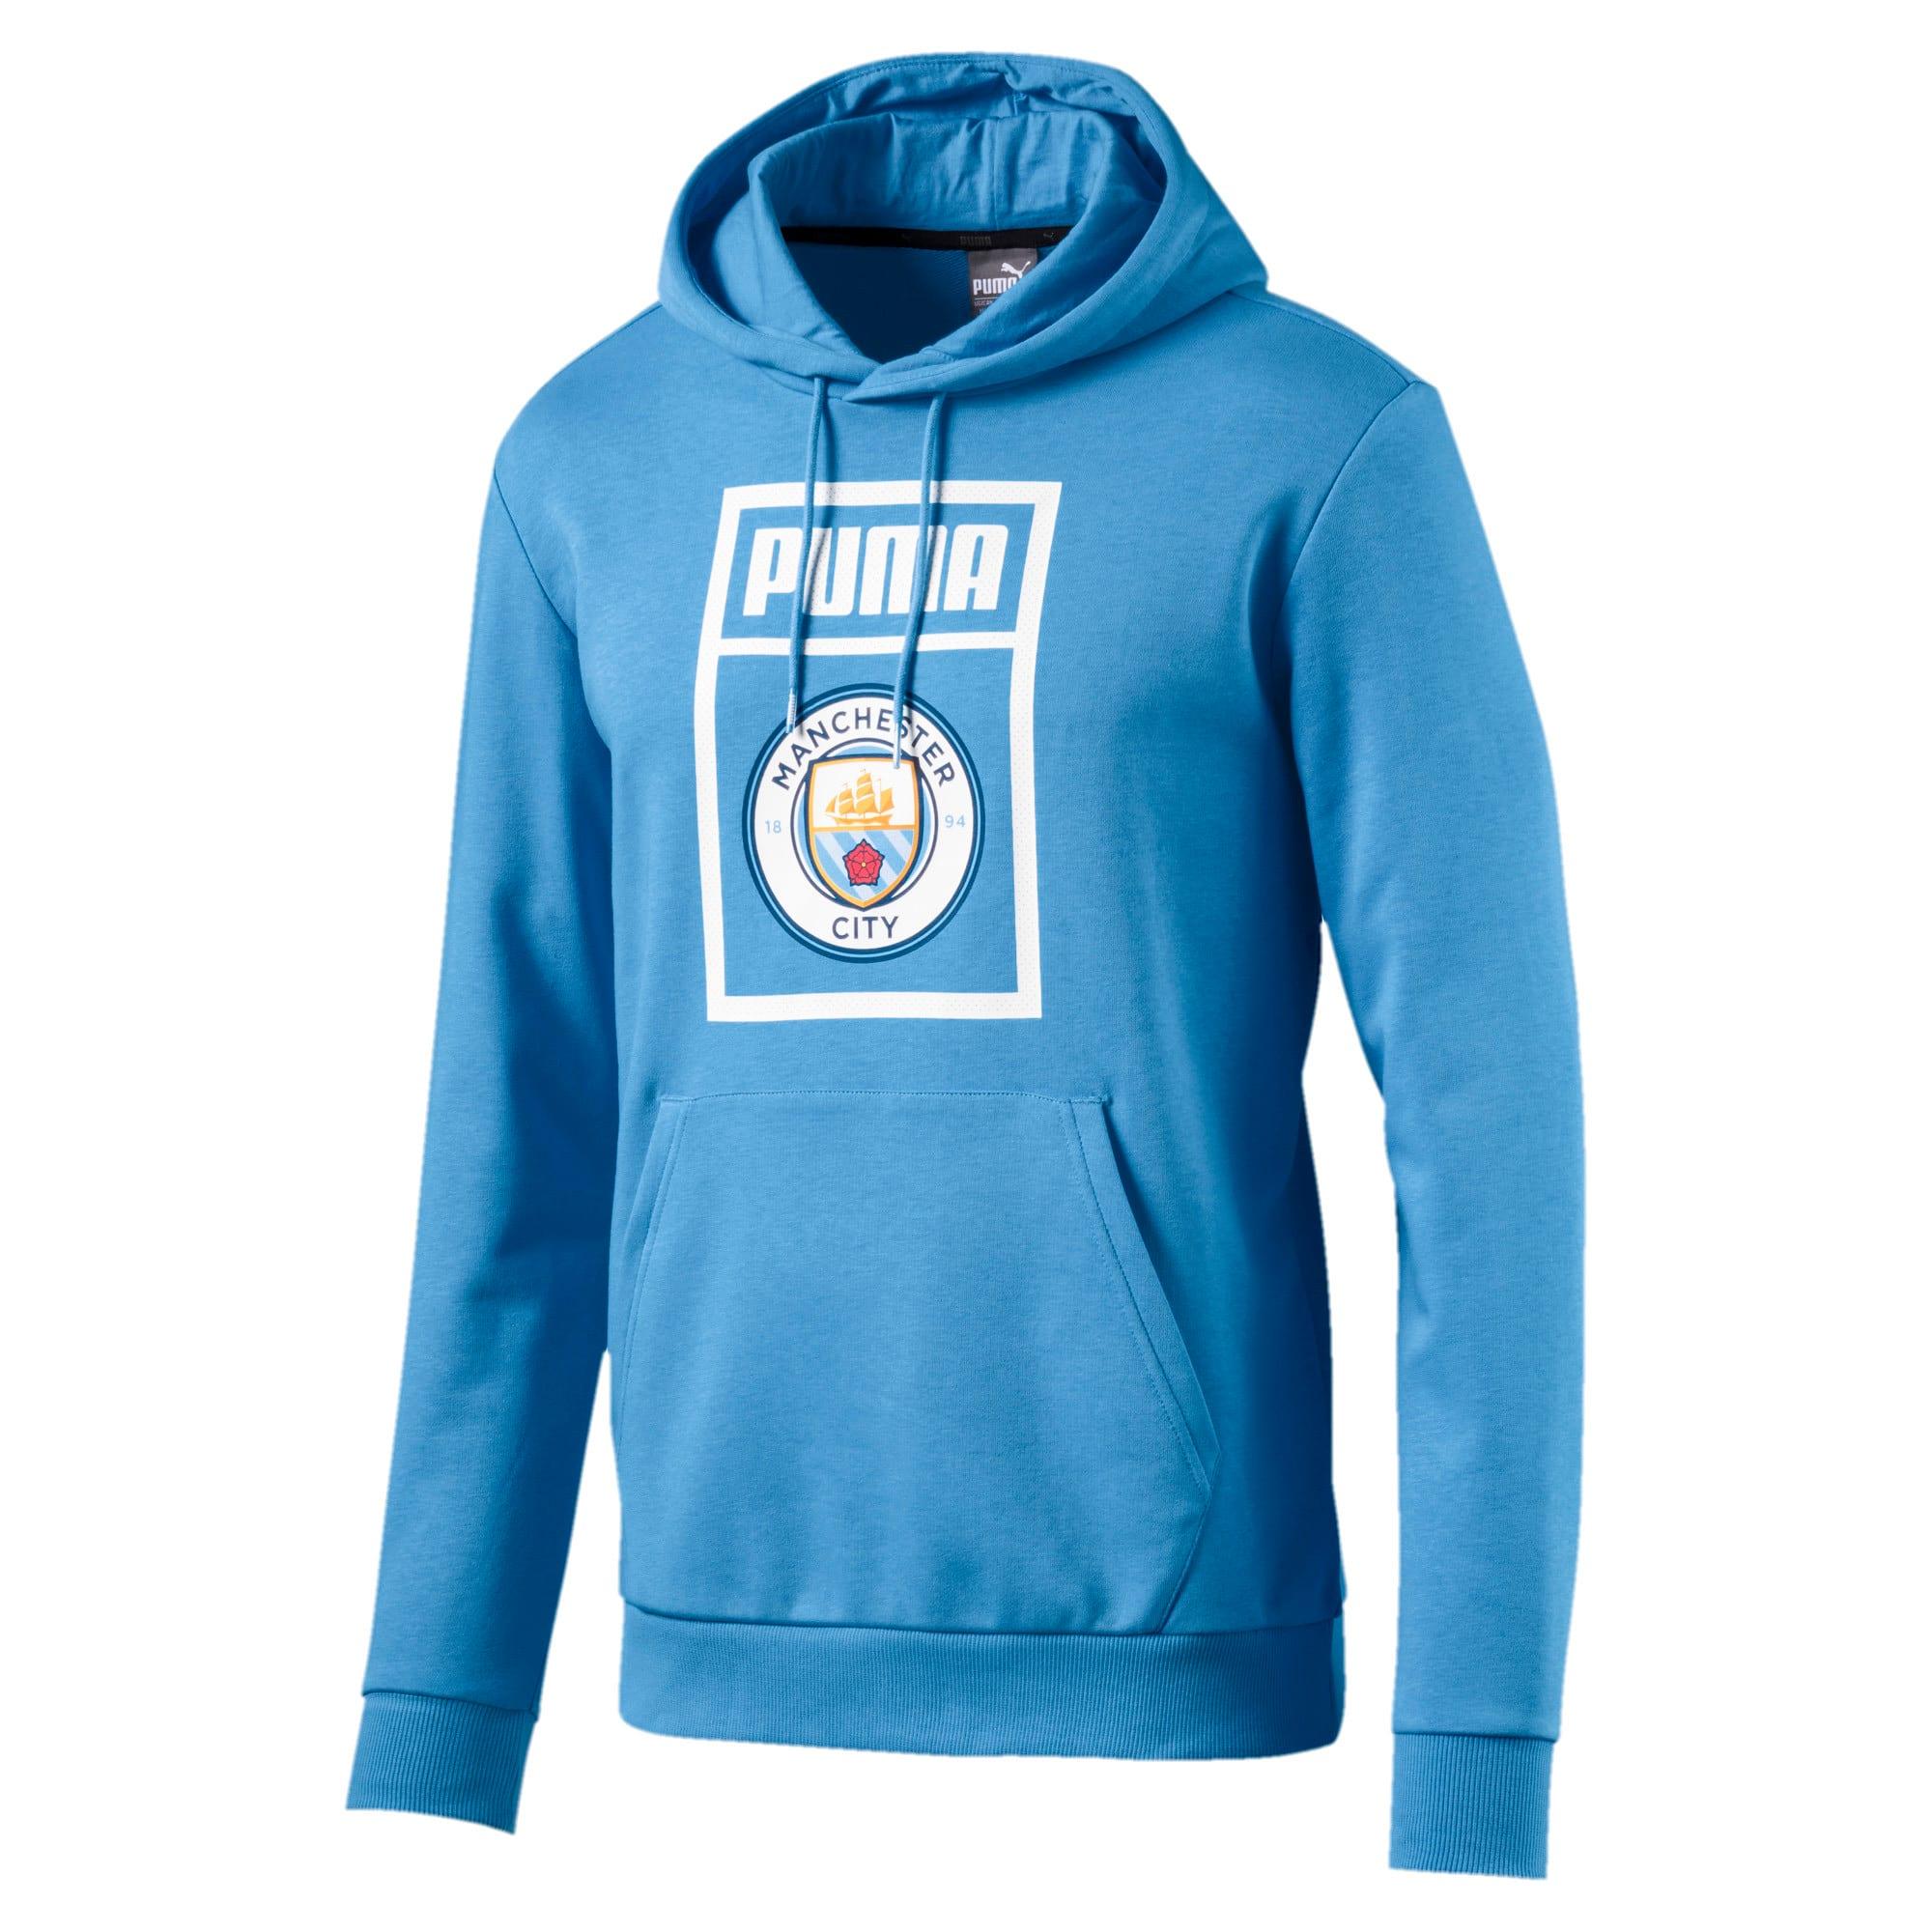 Thumbnail 1 of Manchester City FC Men's Shoe Tag Hoodie, Team Light Blue-Puma White, medium